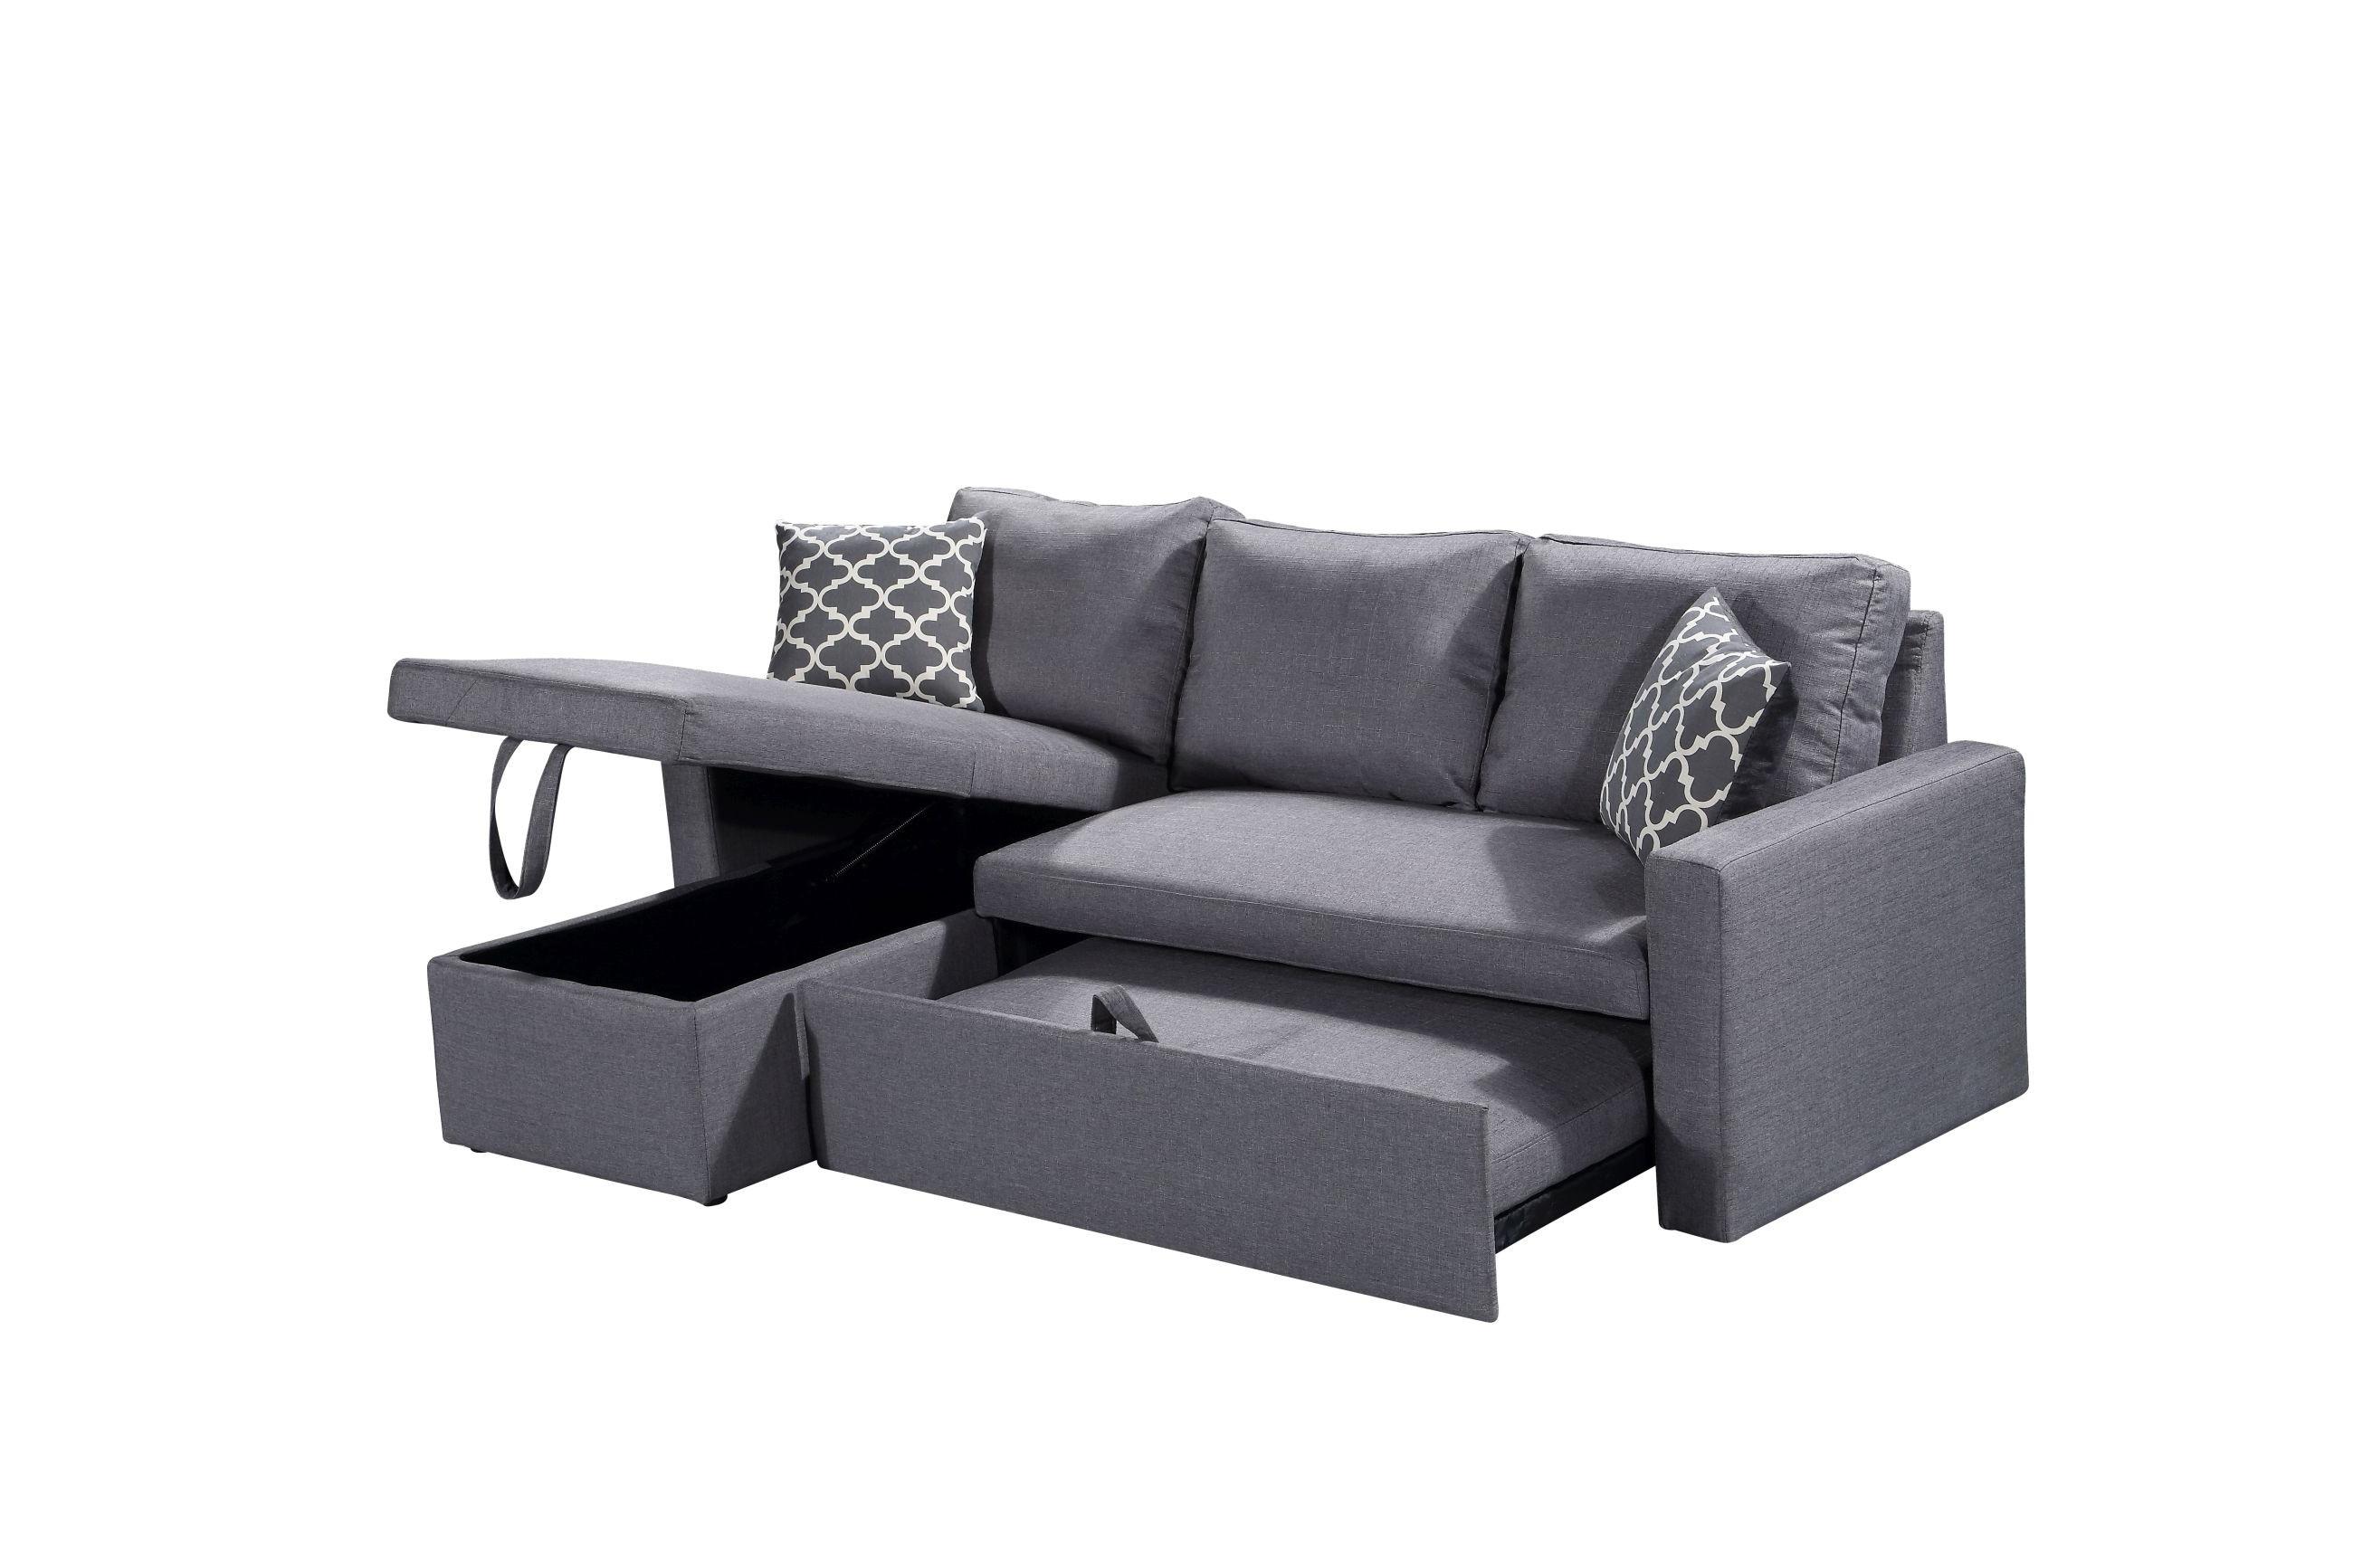 Fundas sofa Baratas Carrefour Drdp Fundas Para sofas Carrefour Luxury Foulard sofa Zara Home DiseO